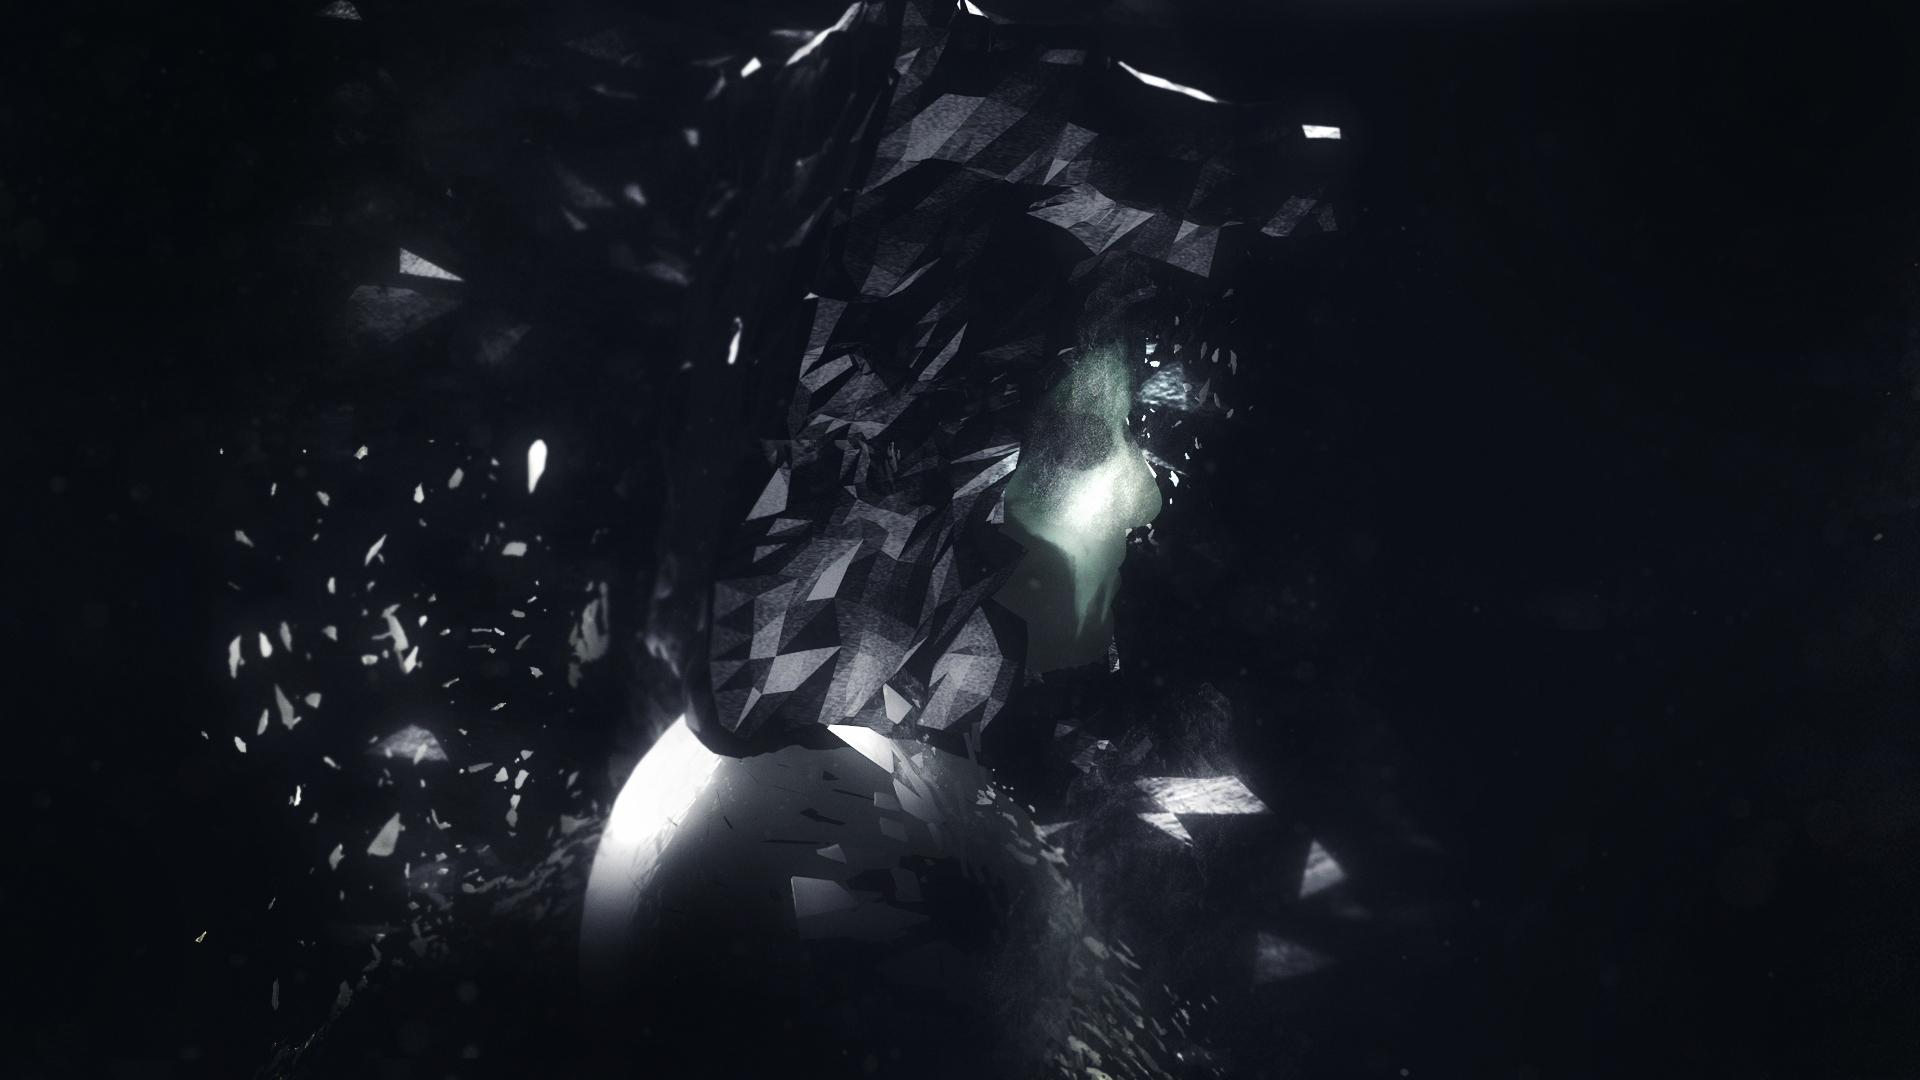 Graphika_Jungle_Ghosts_f010.jpg